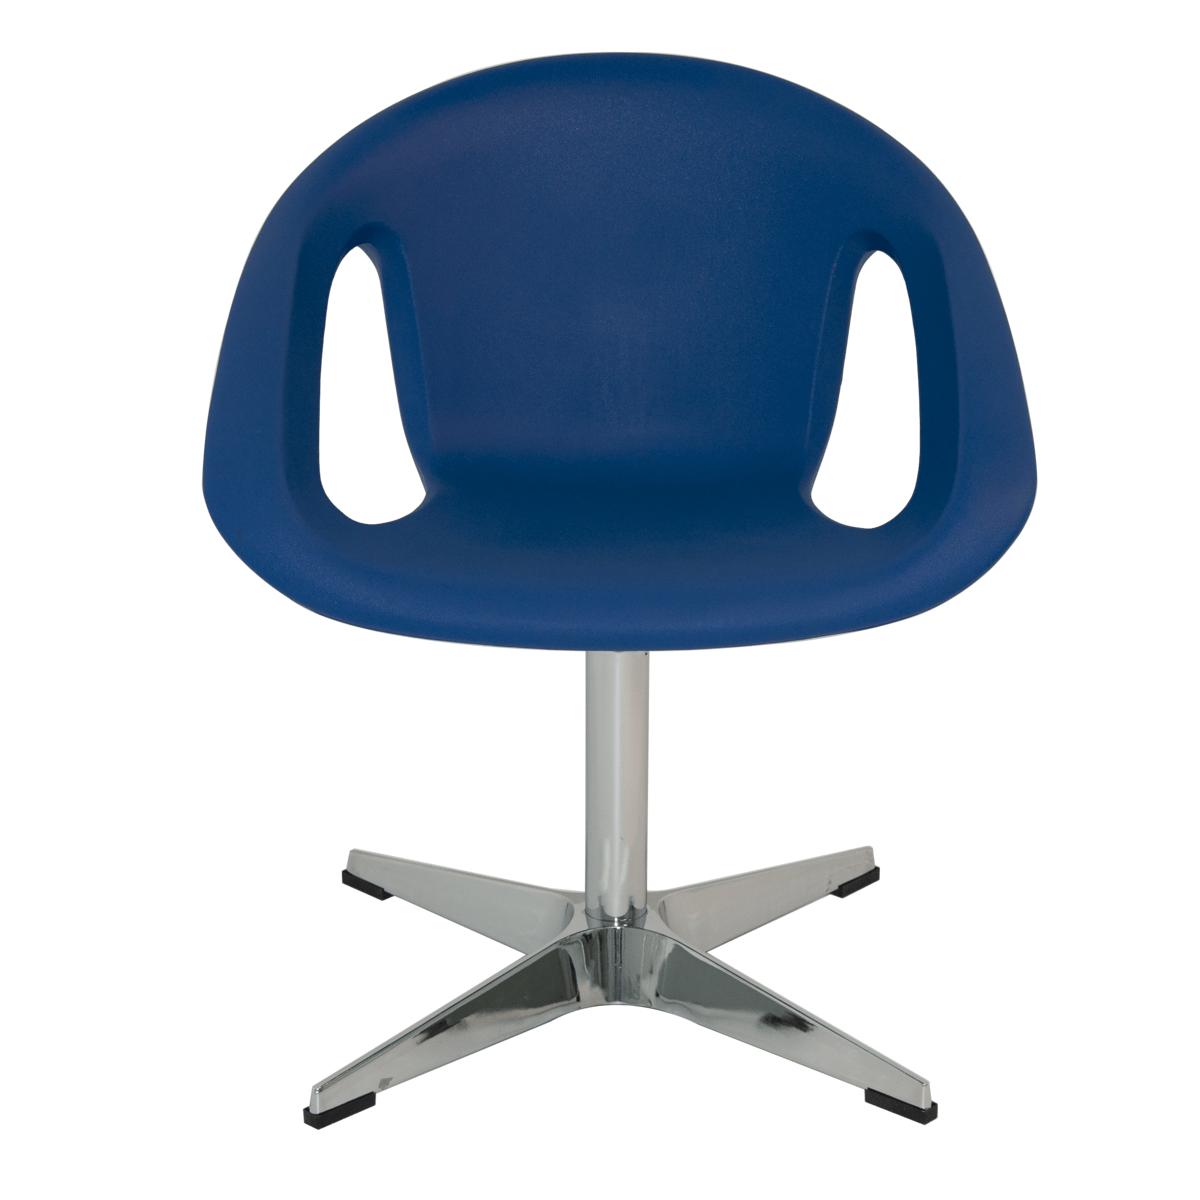 Cadeira Tramontina Delice Mariner em Polietileno com base X 92705030